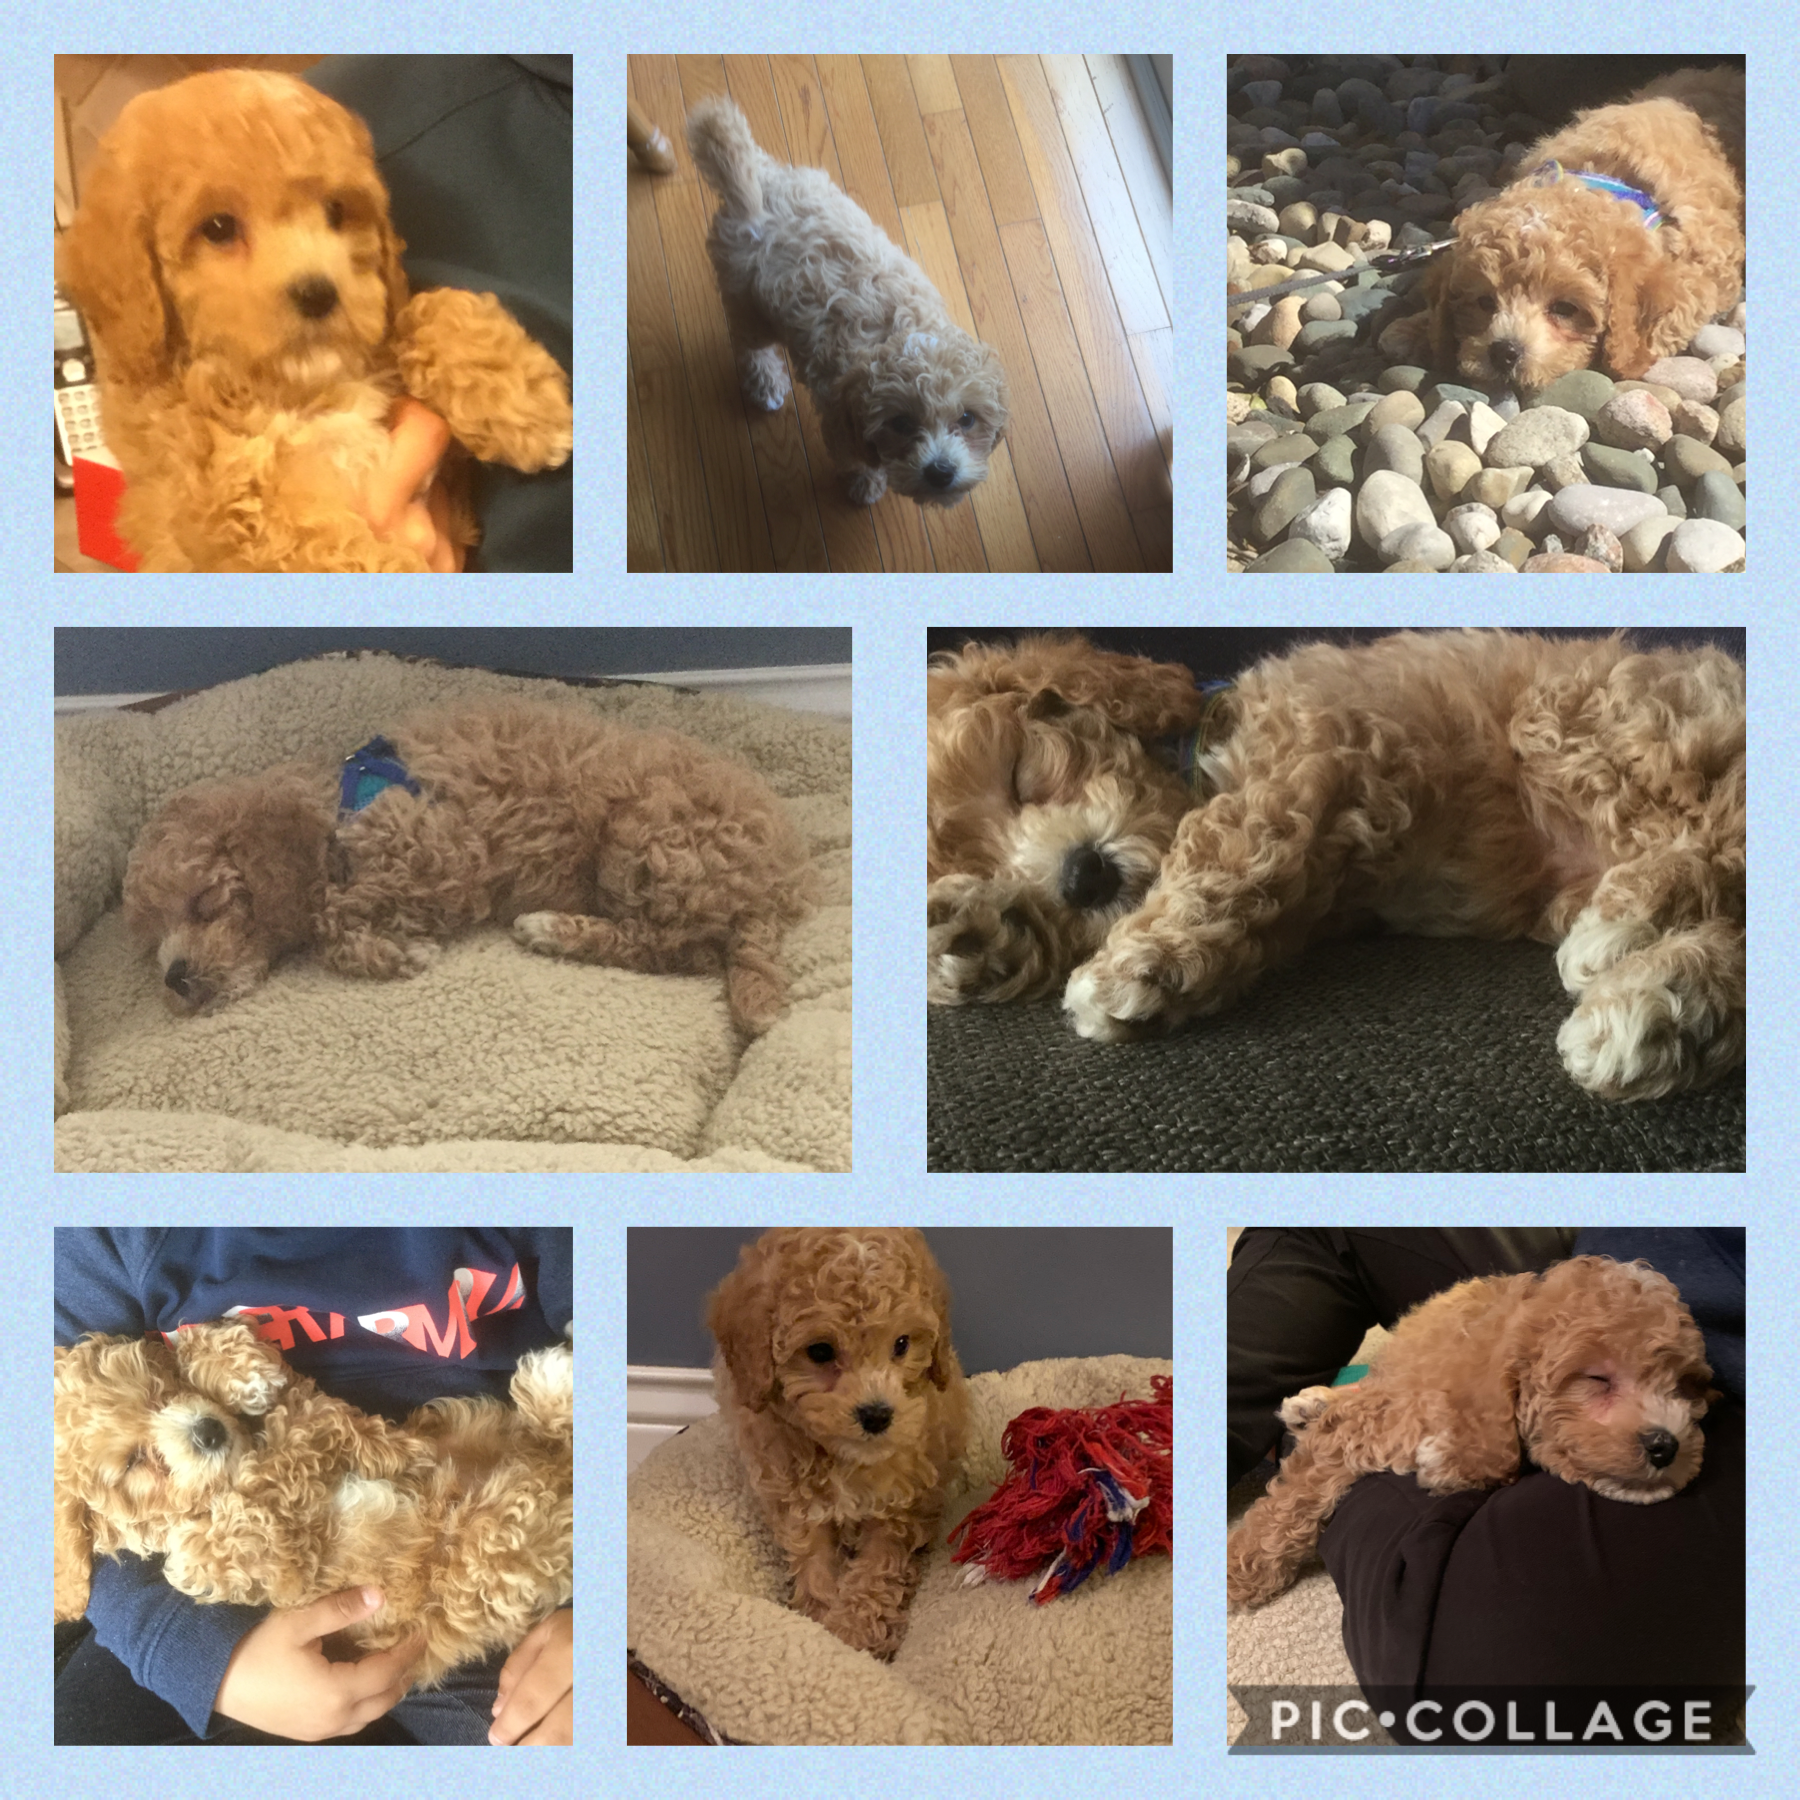 my new puppy cooper!